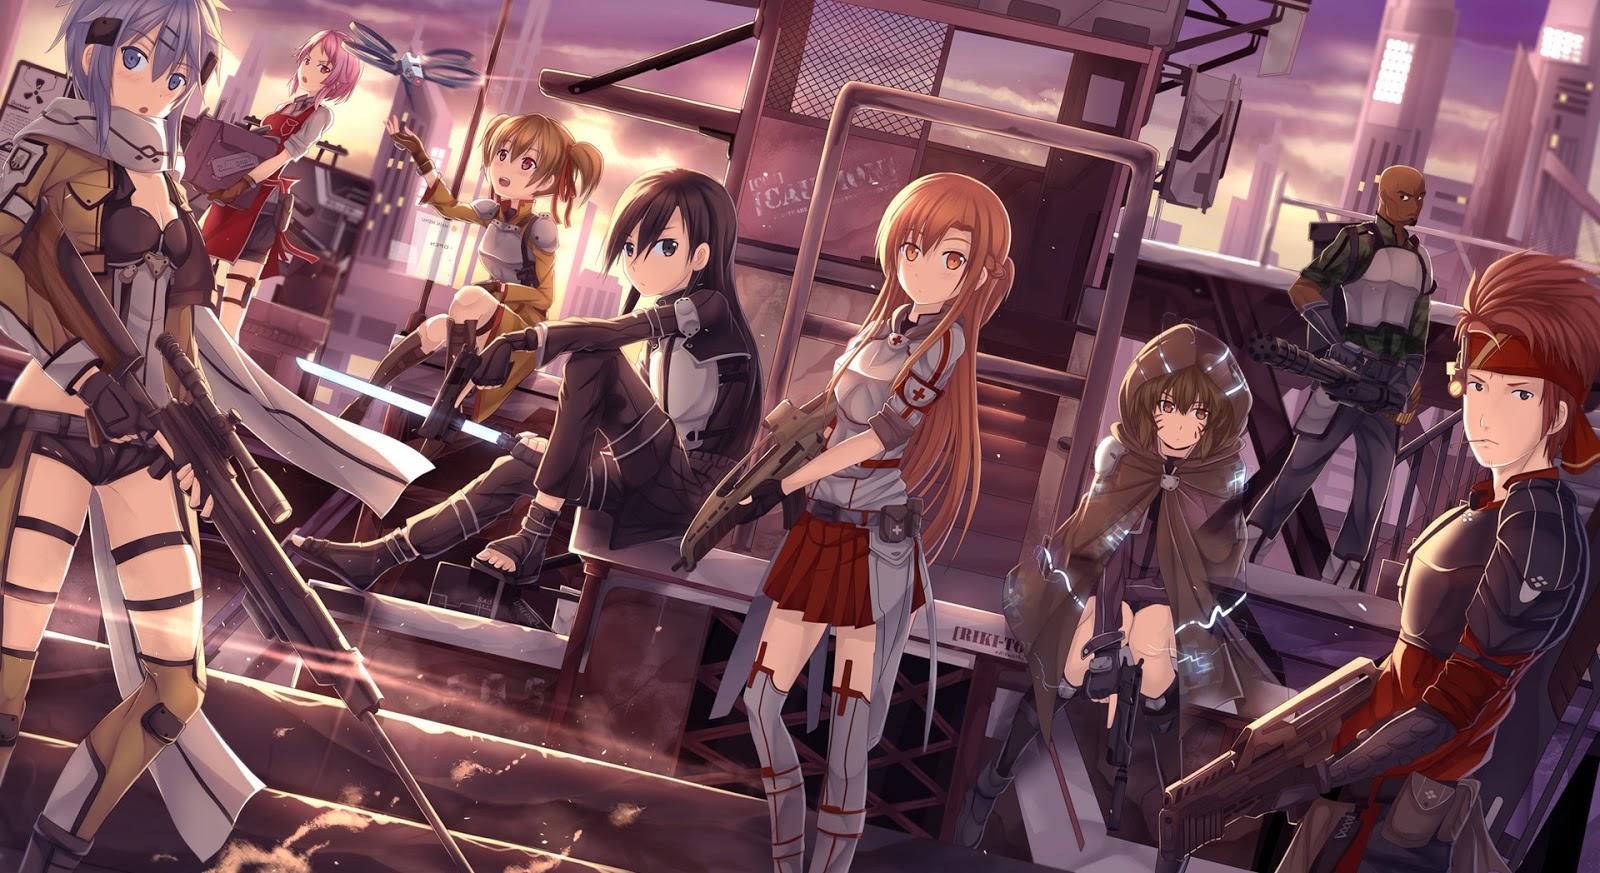 Sword Art Online : Gun Gale Online (GGO)